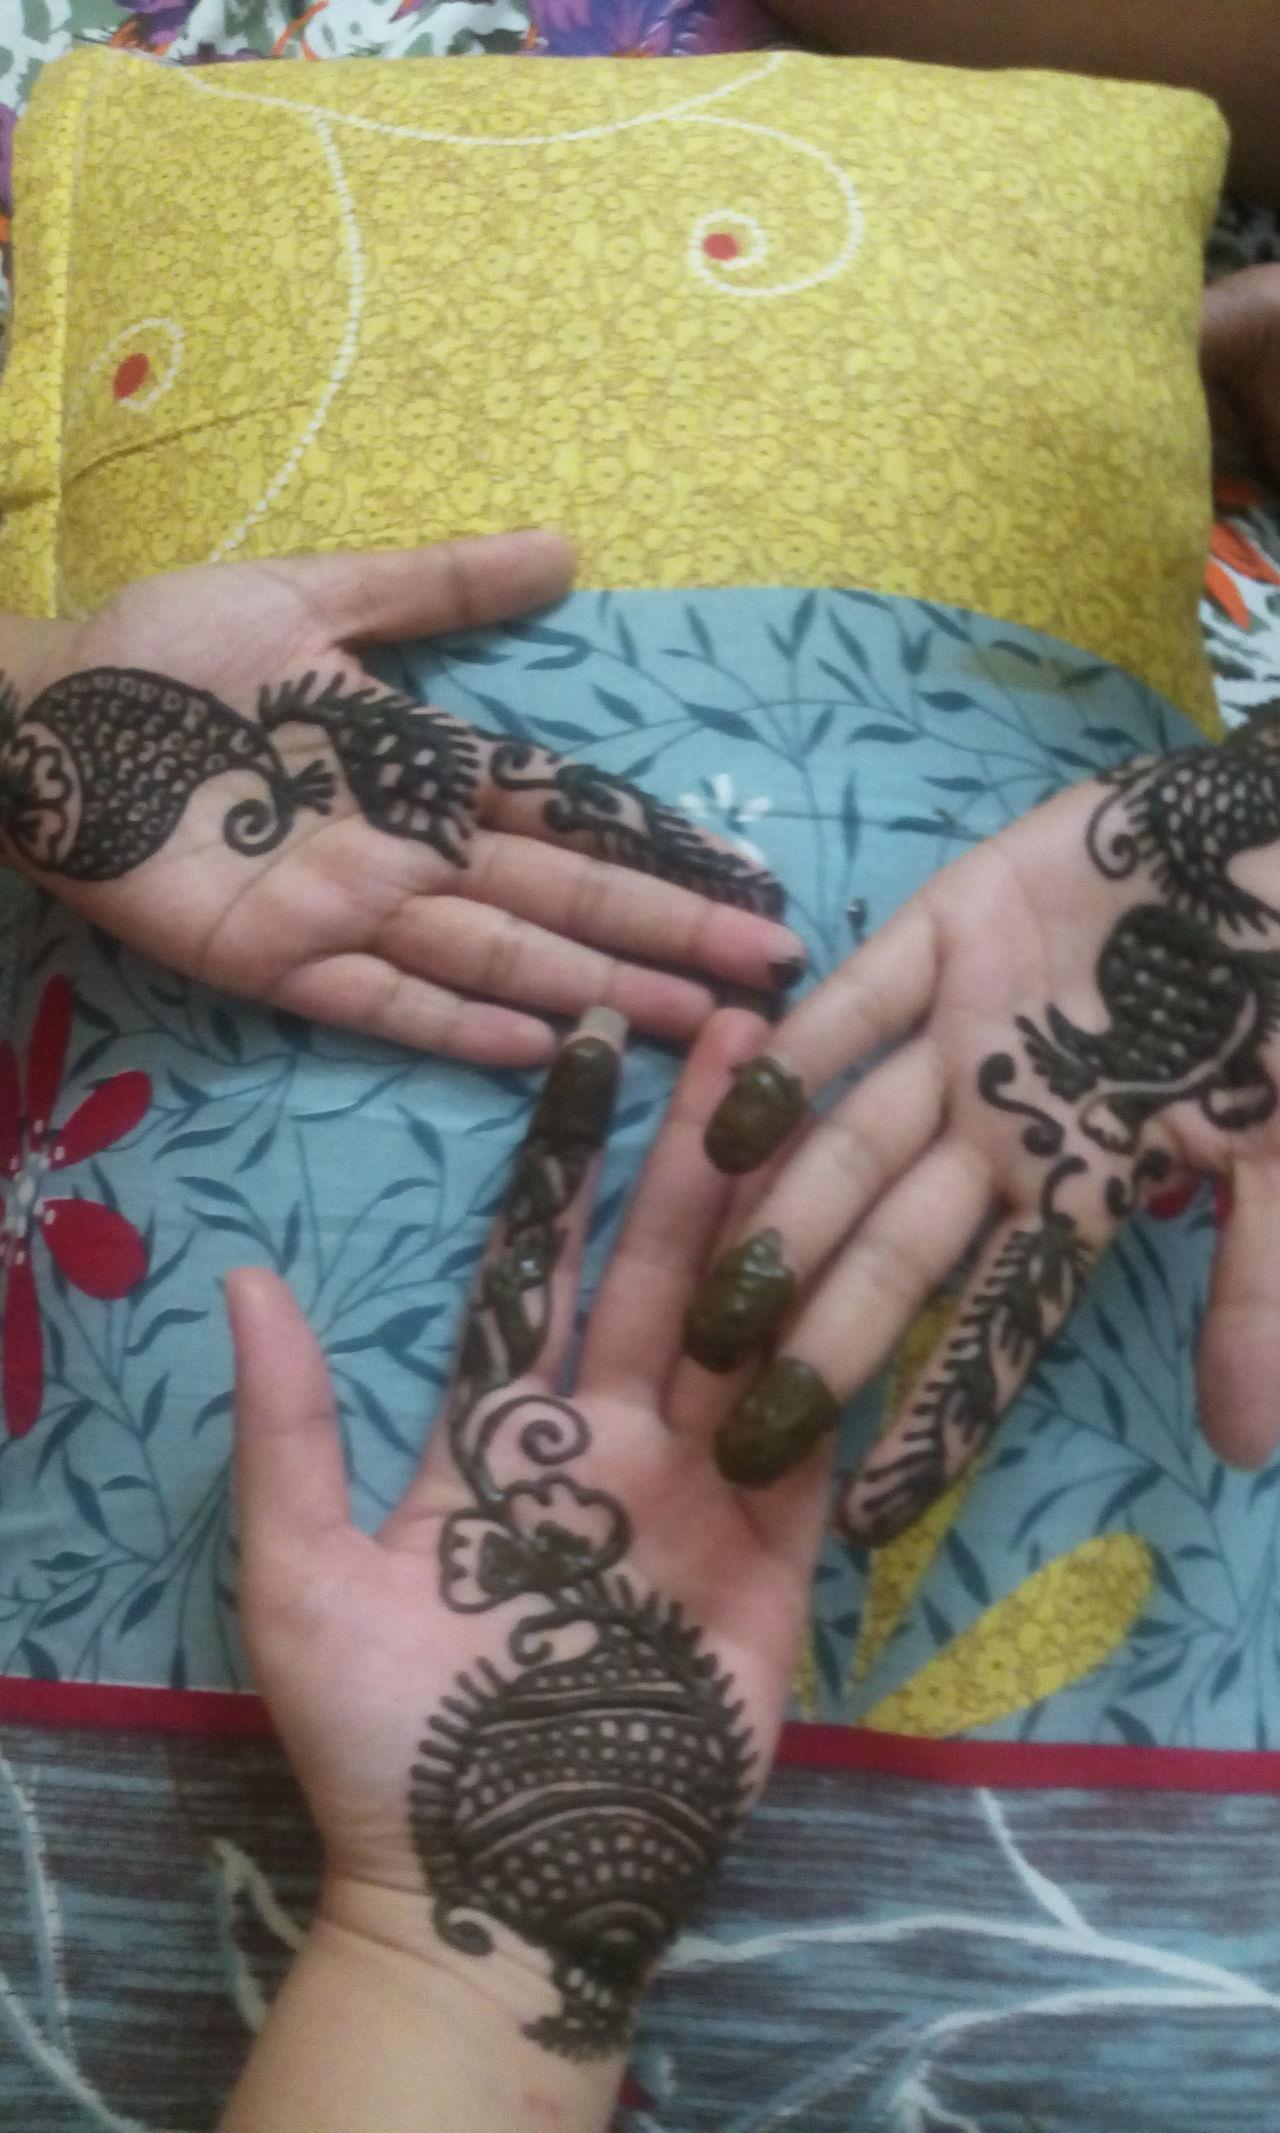 Celebrations Celebrating Diwali Henna Henna Tattoo Henna Art Mehendi Art Friends Together Art